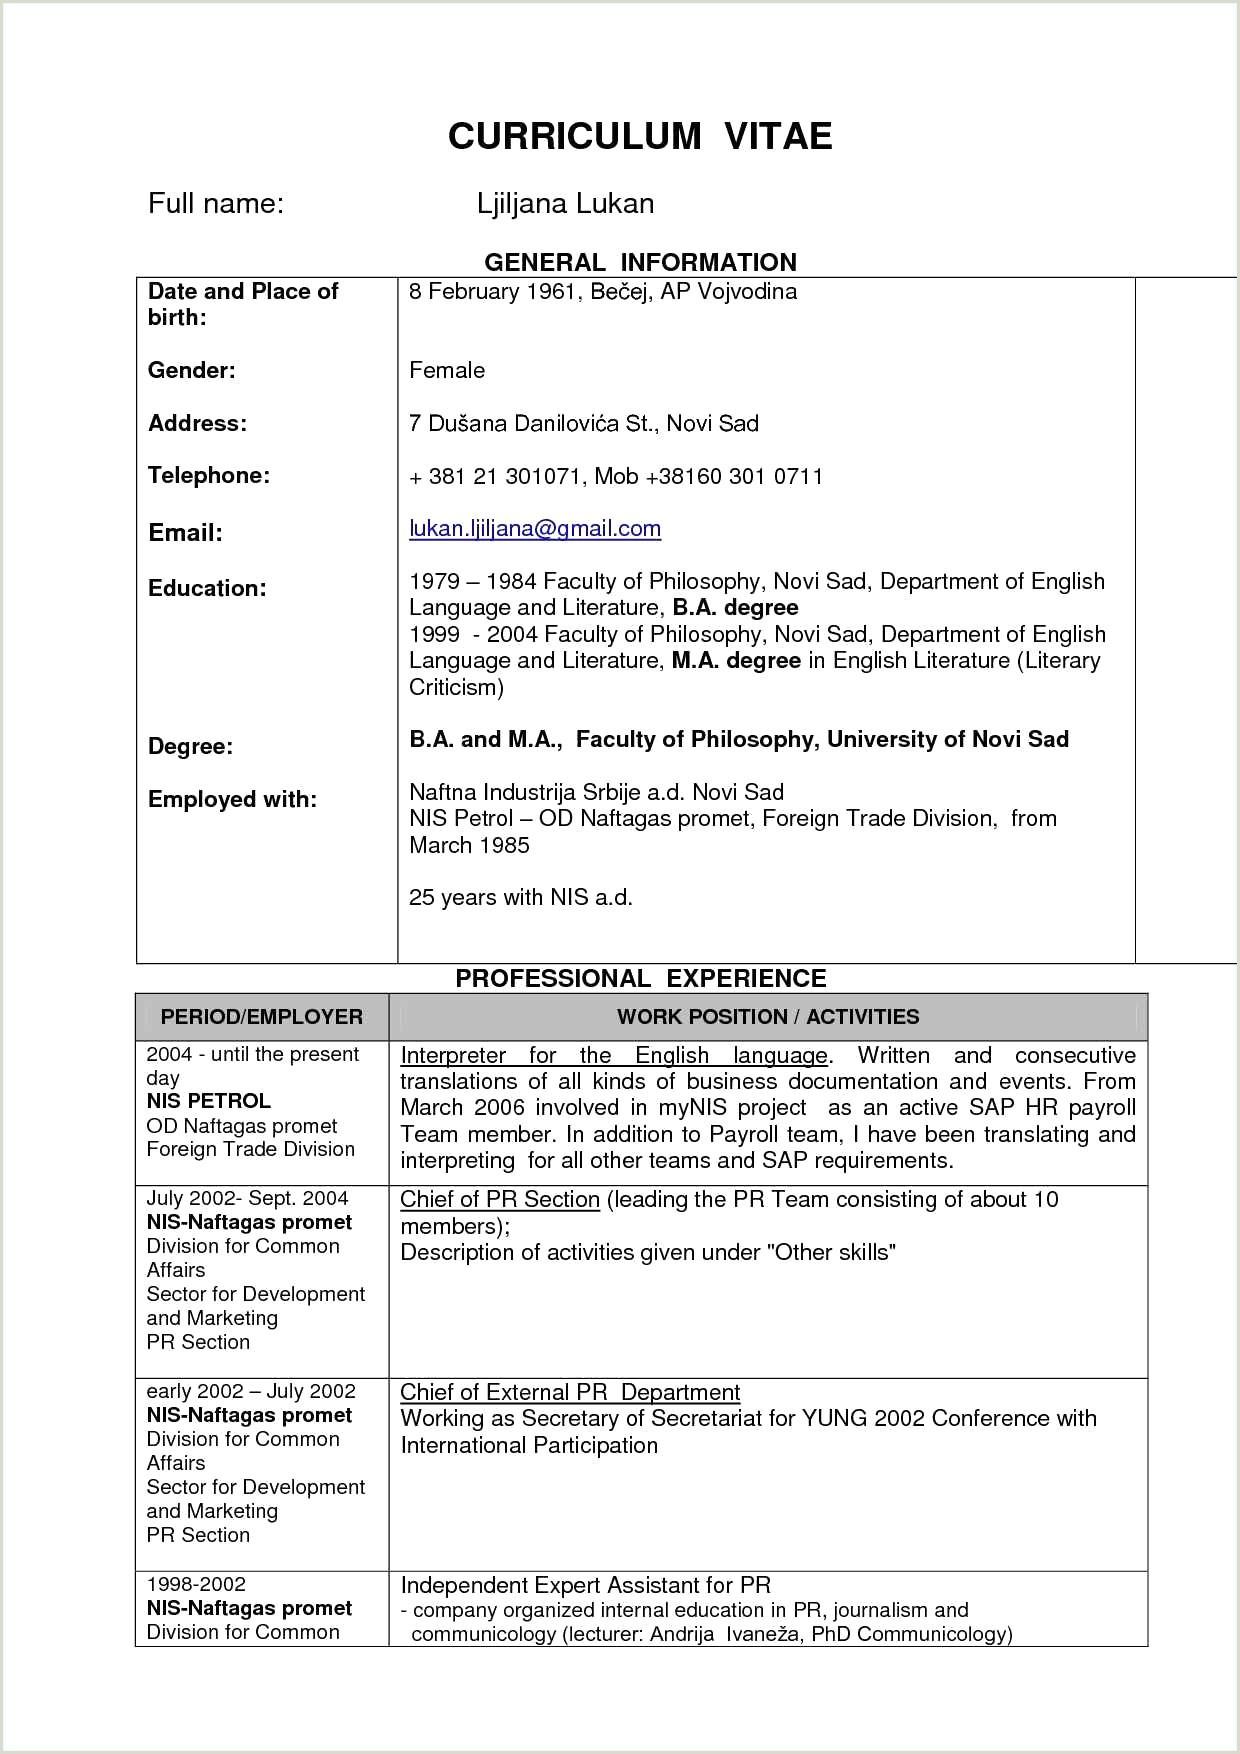 Simple Fresher Resume format Word Simple Resume format for Freshers Free 13 Resume Sample for